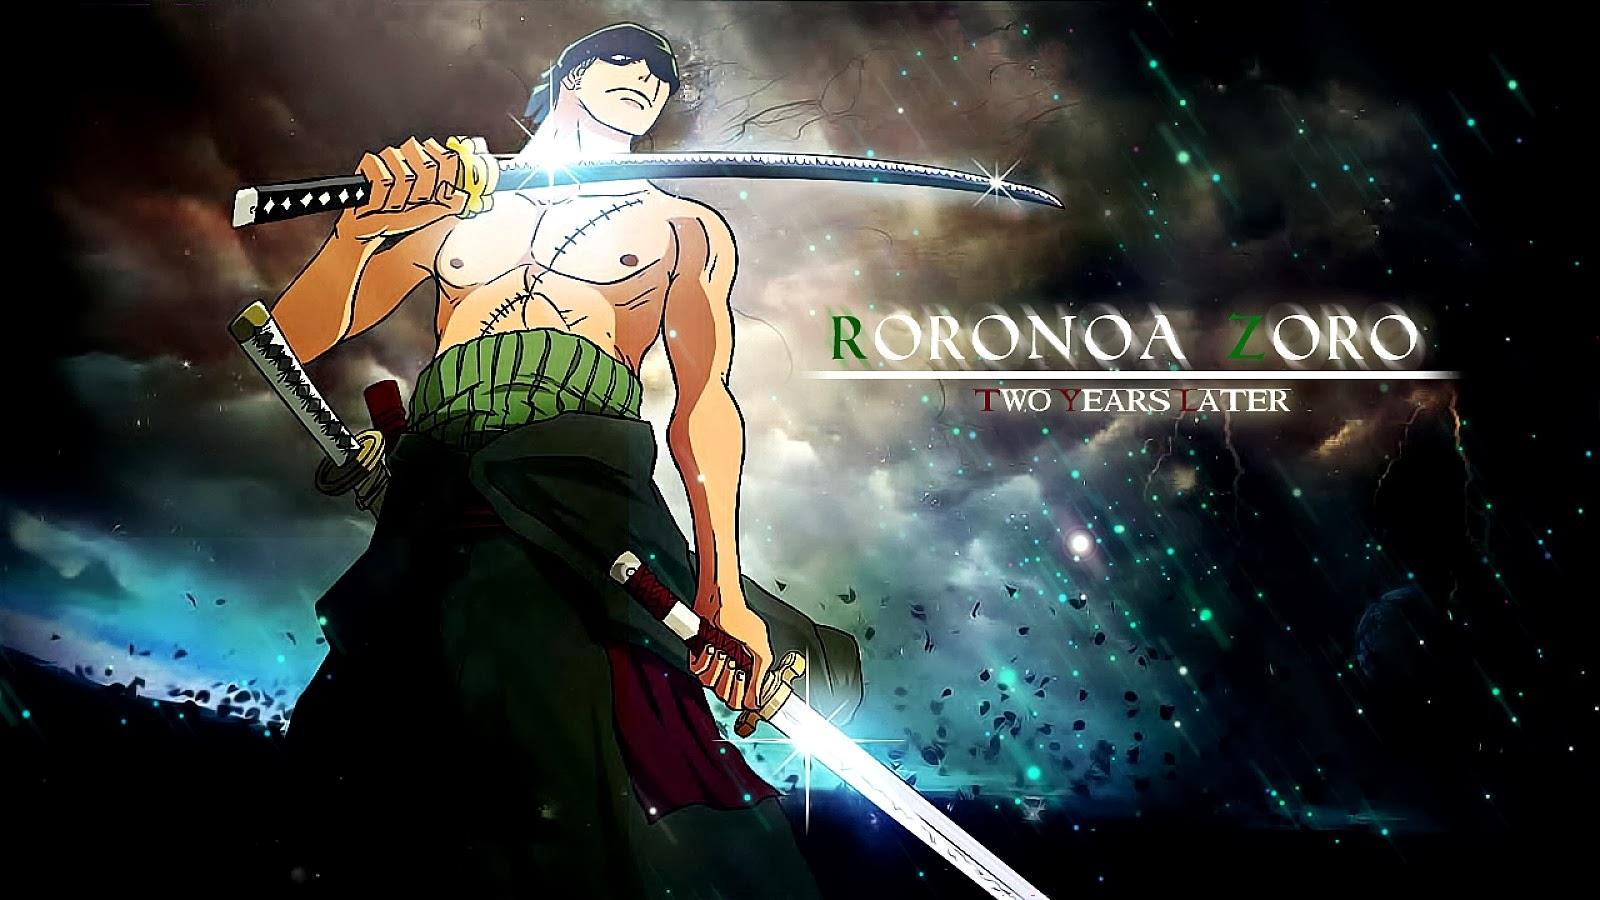 Roronoa Zoro Wallpapers - beauty walpaper